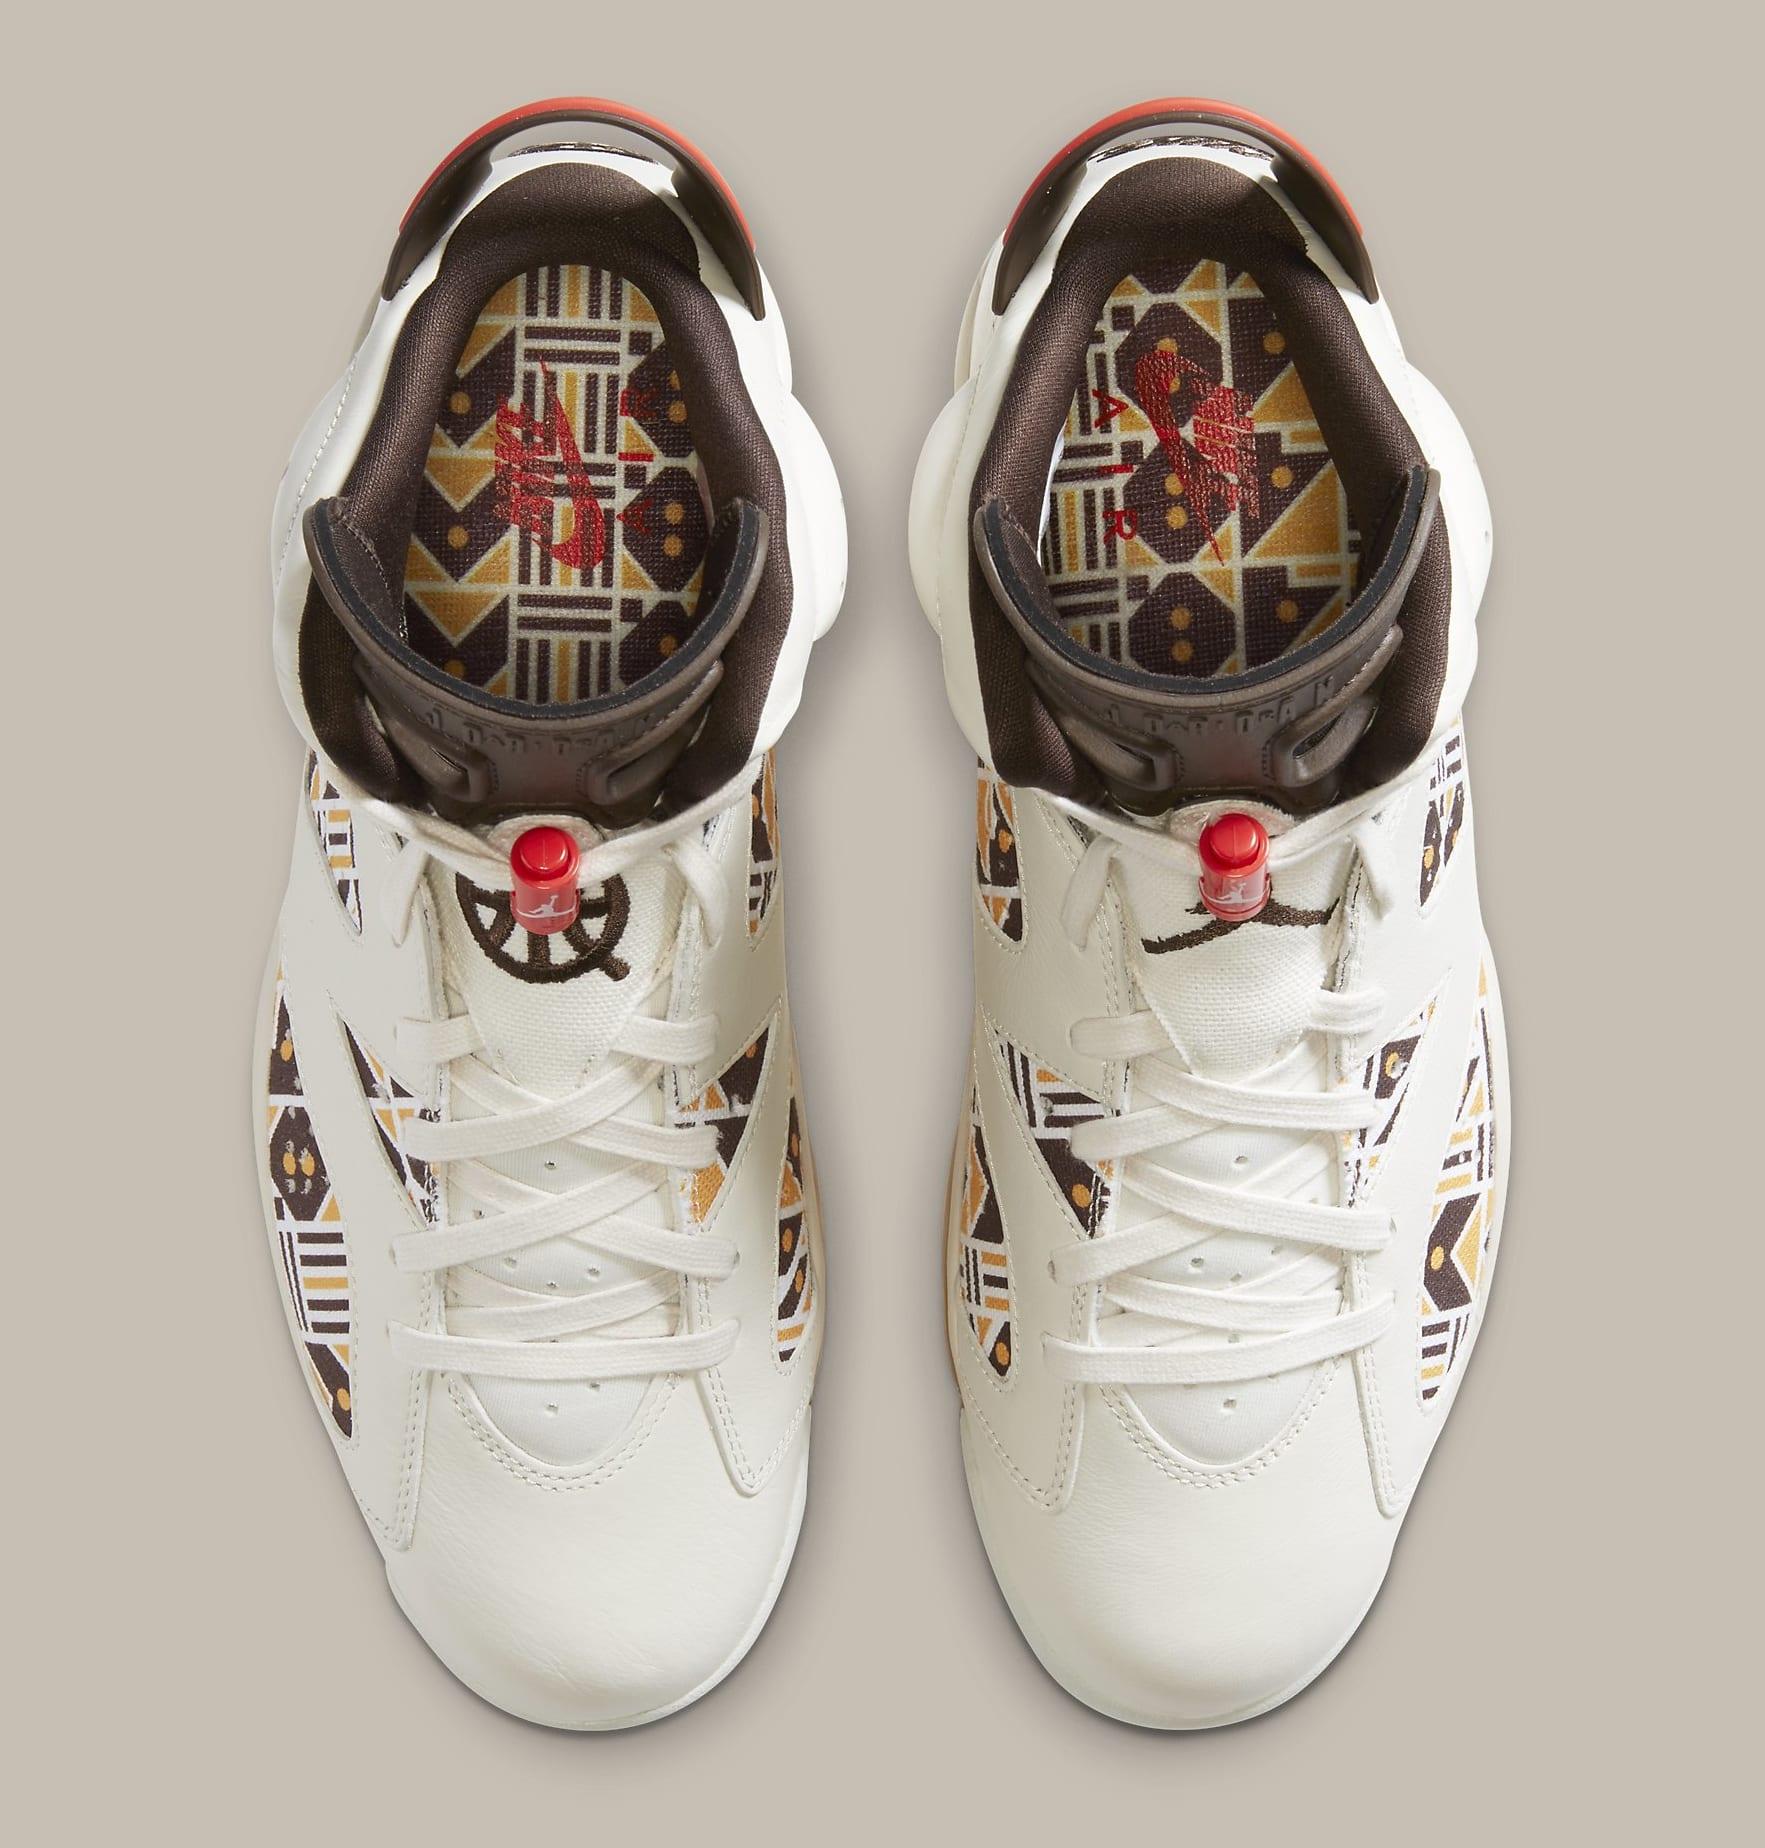 Air Jordan 6 Retro 'Quai 54' CZ4152-100 Top